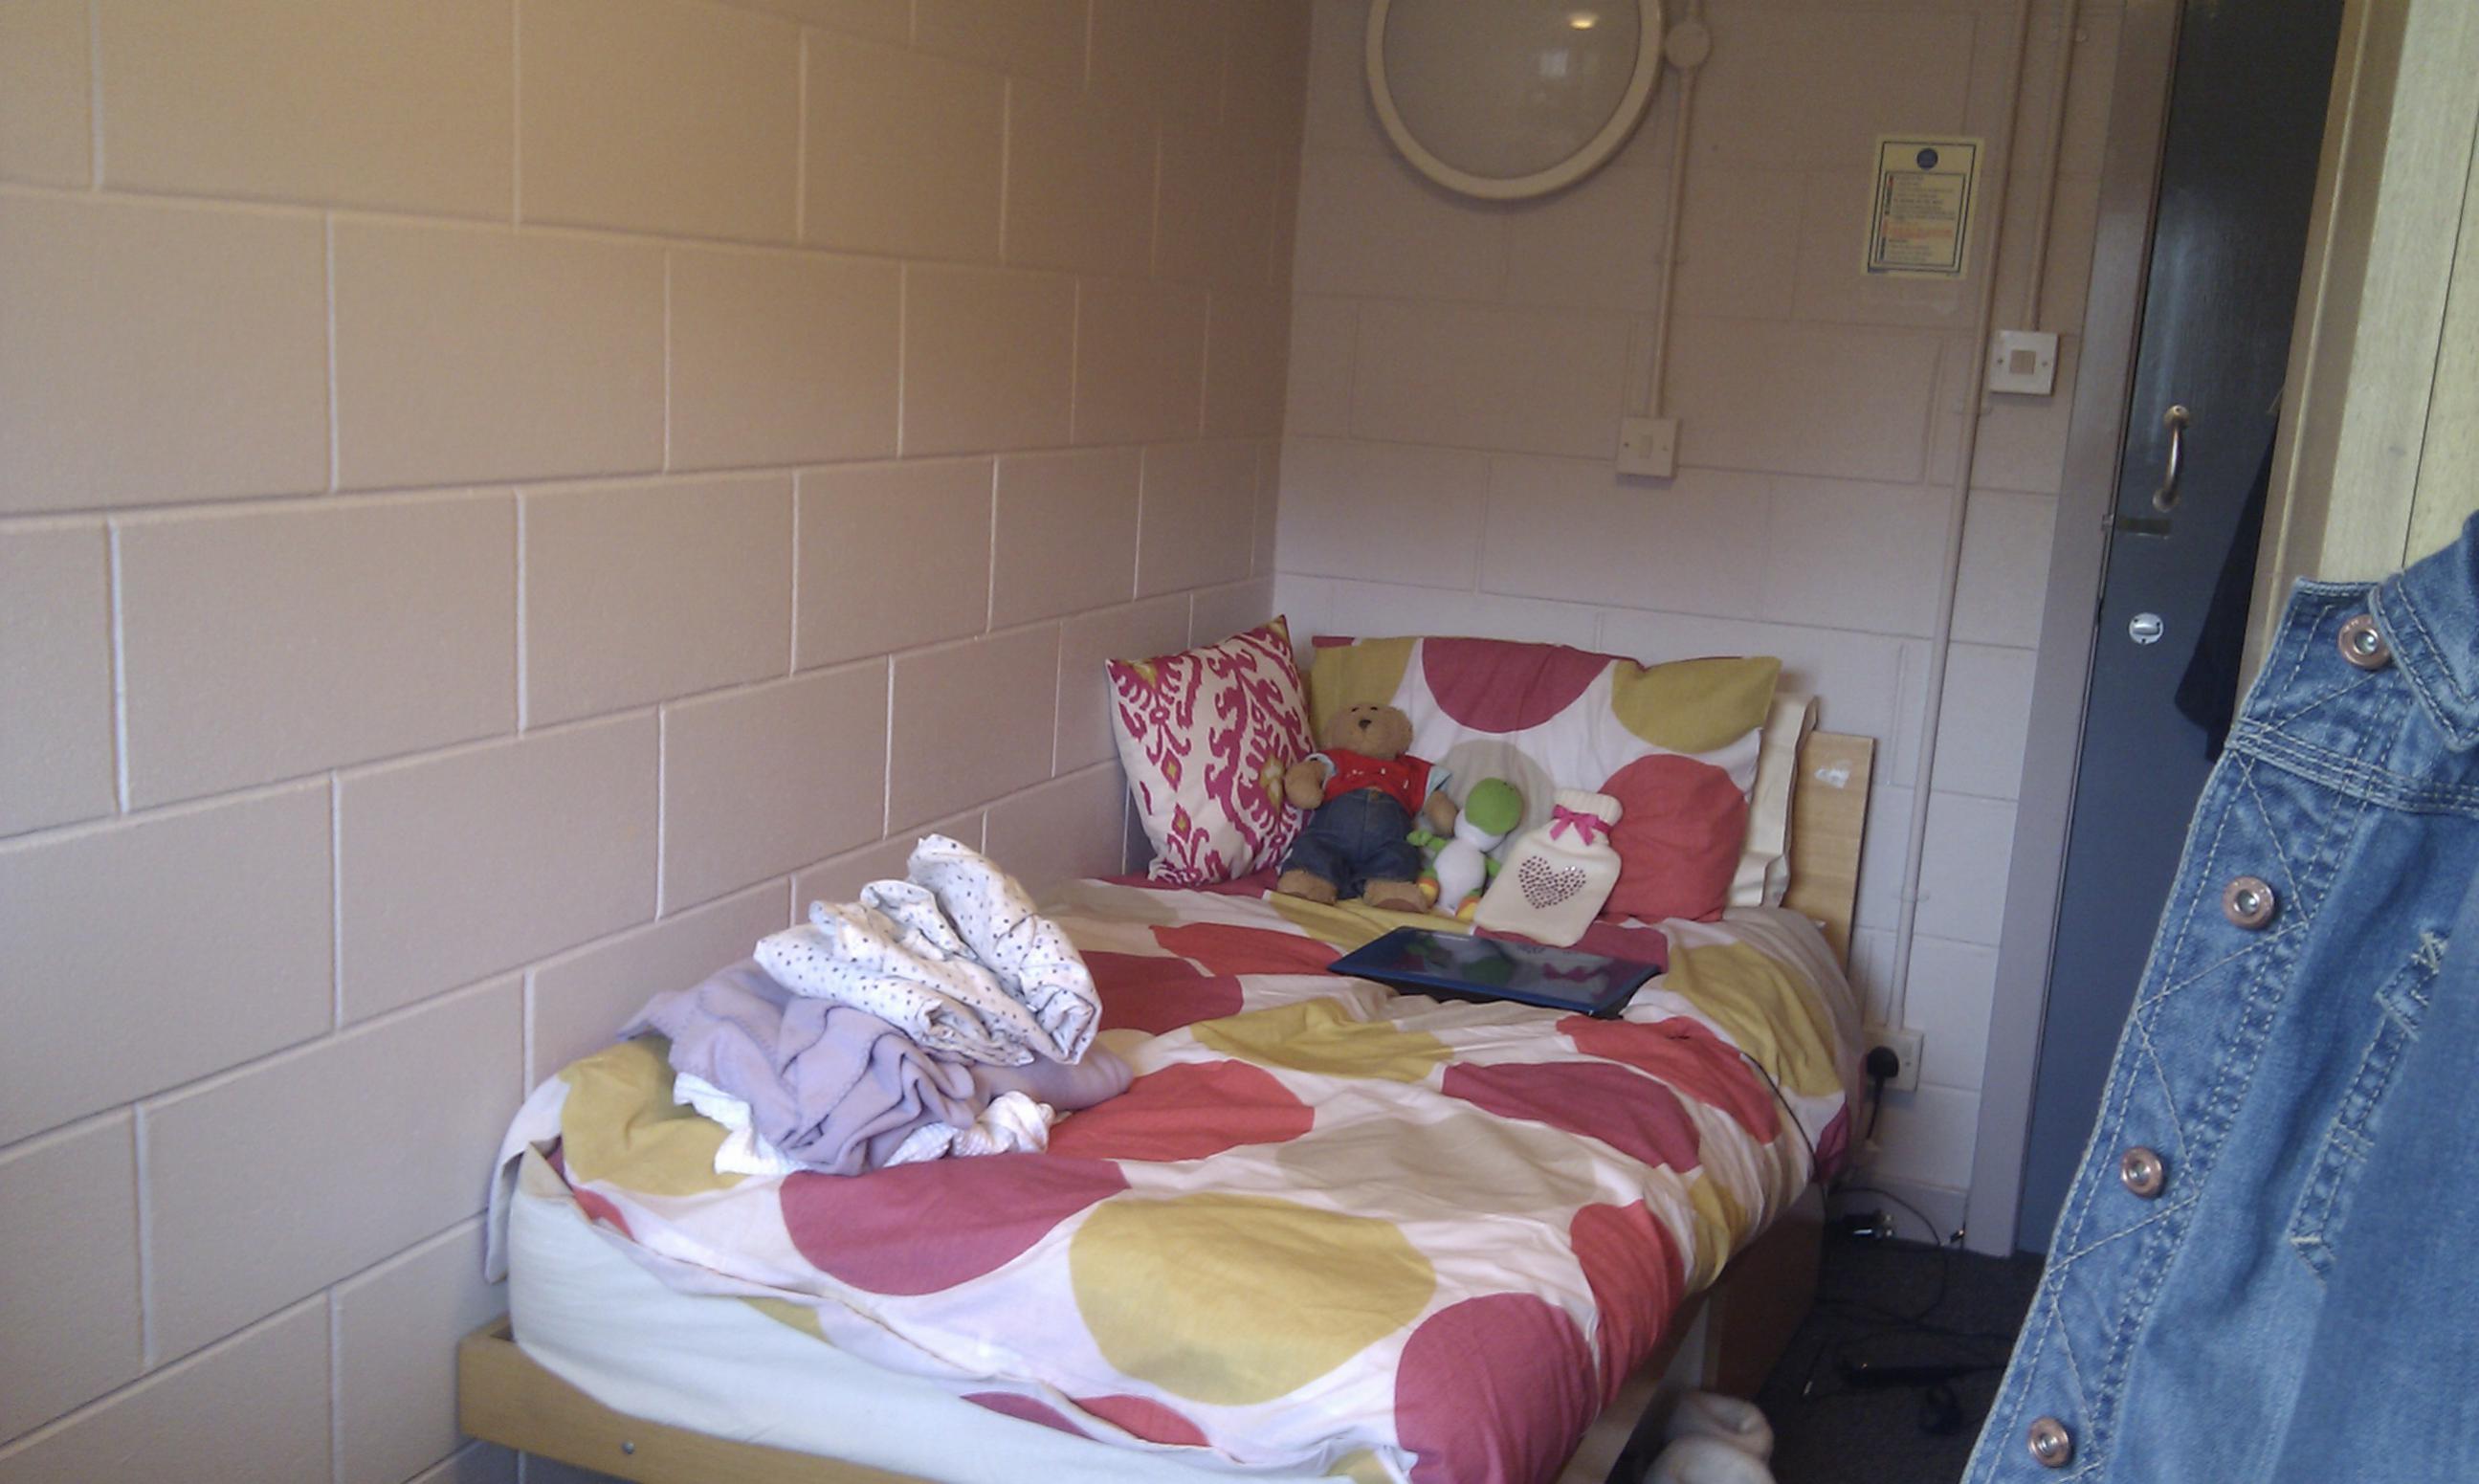 Rgu Accommodation Student Room